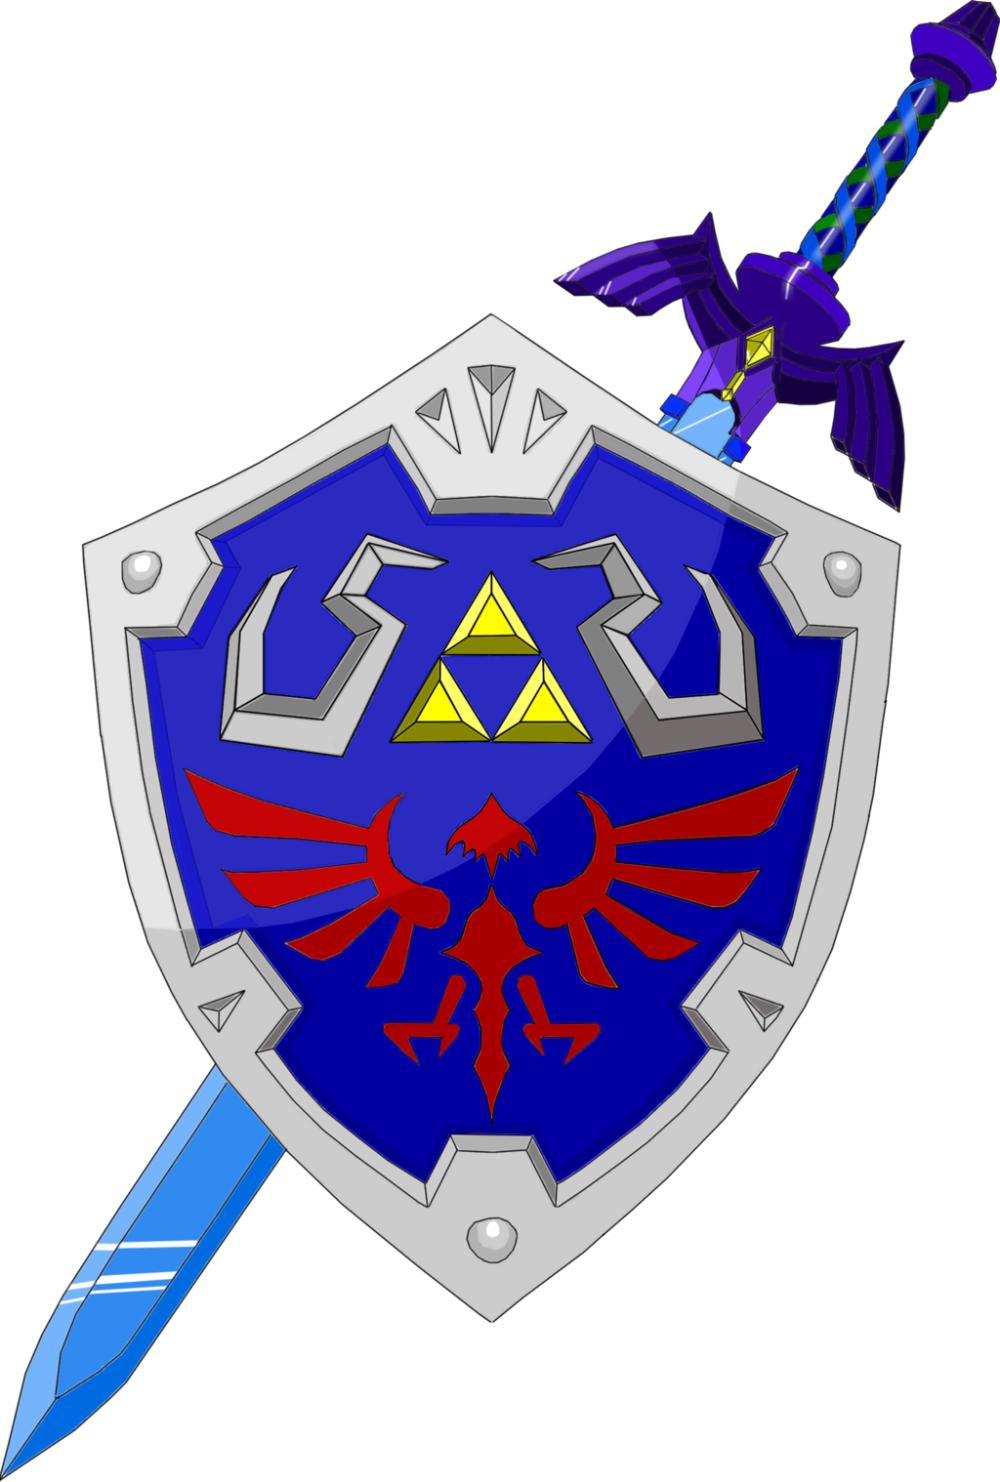 Pin By Trey Bourgeois On Legend Of Zelda Master Sword Clip Art Library Zelda Master Sword